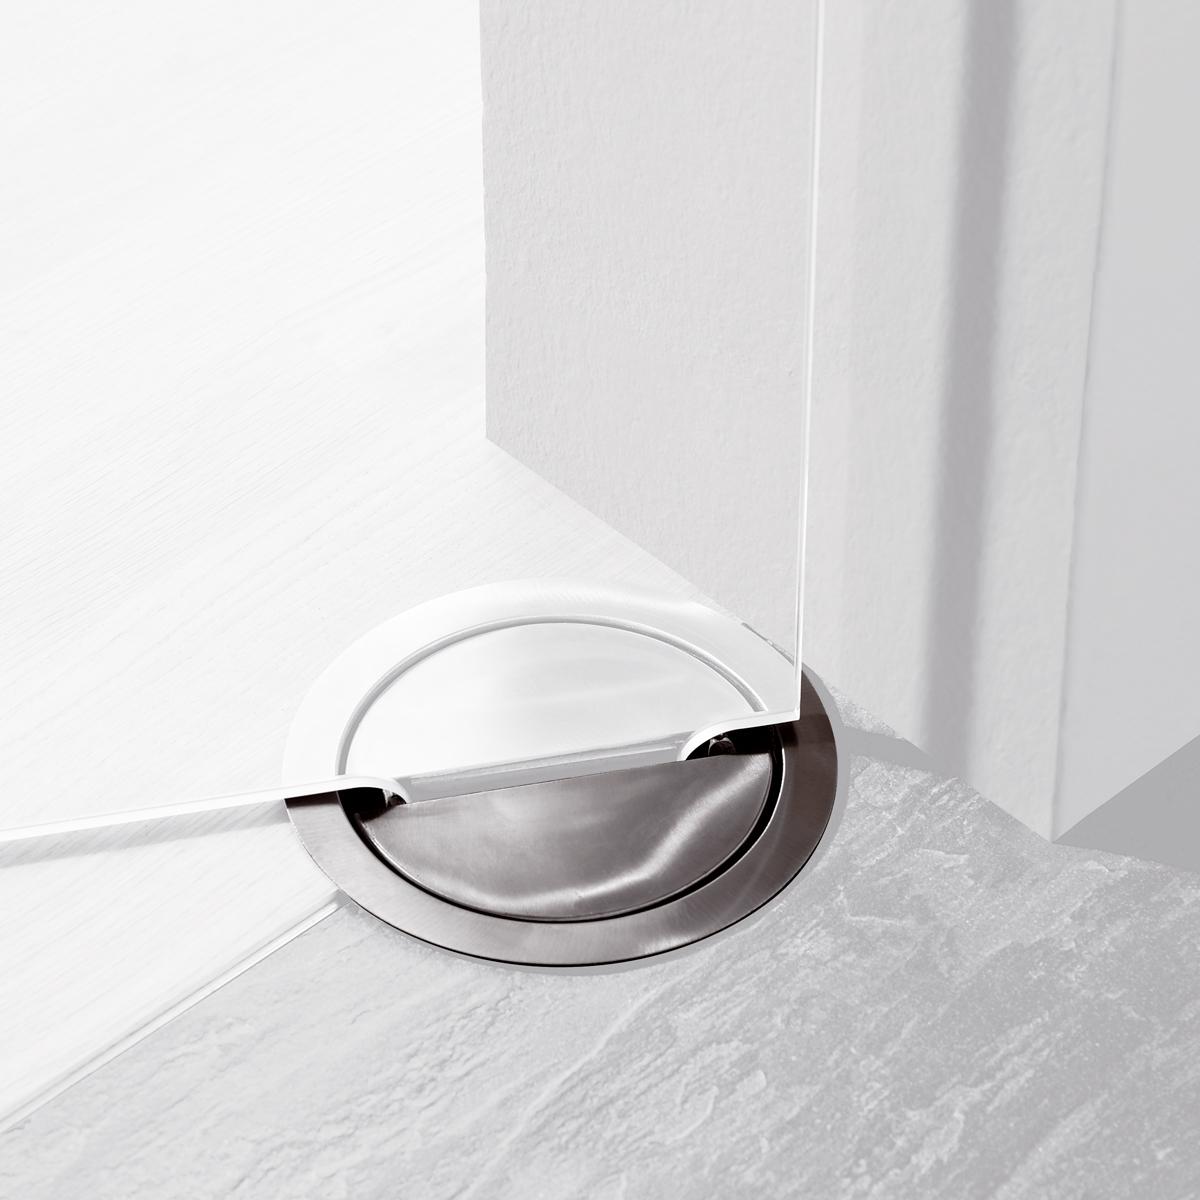 Dorma Visur Concealed Hardware For Double Acting Doors